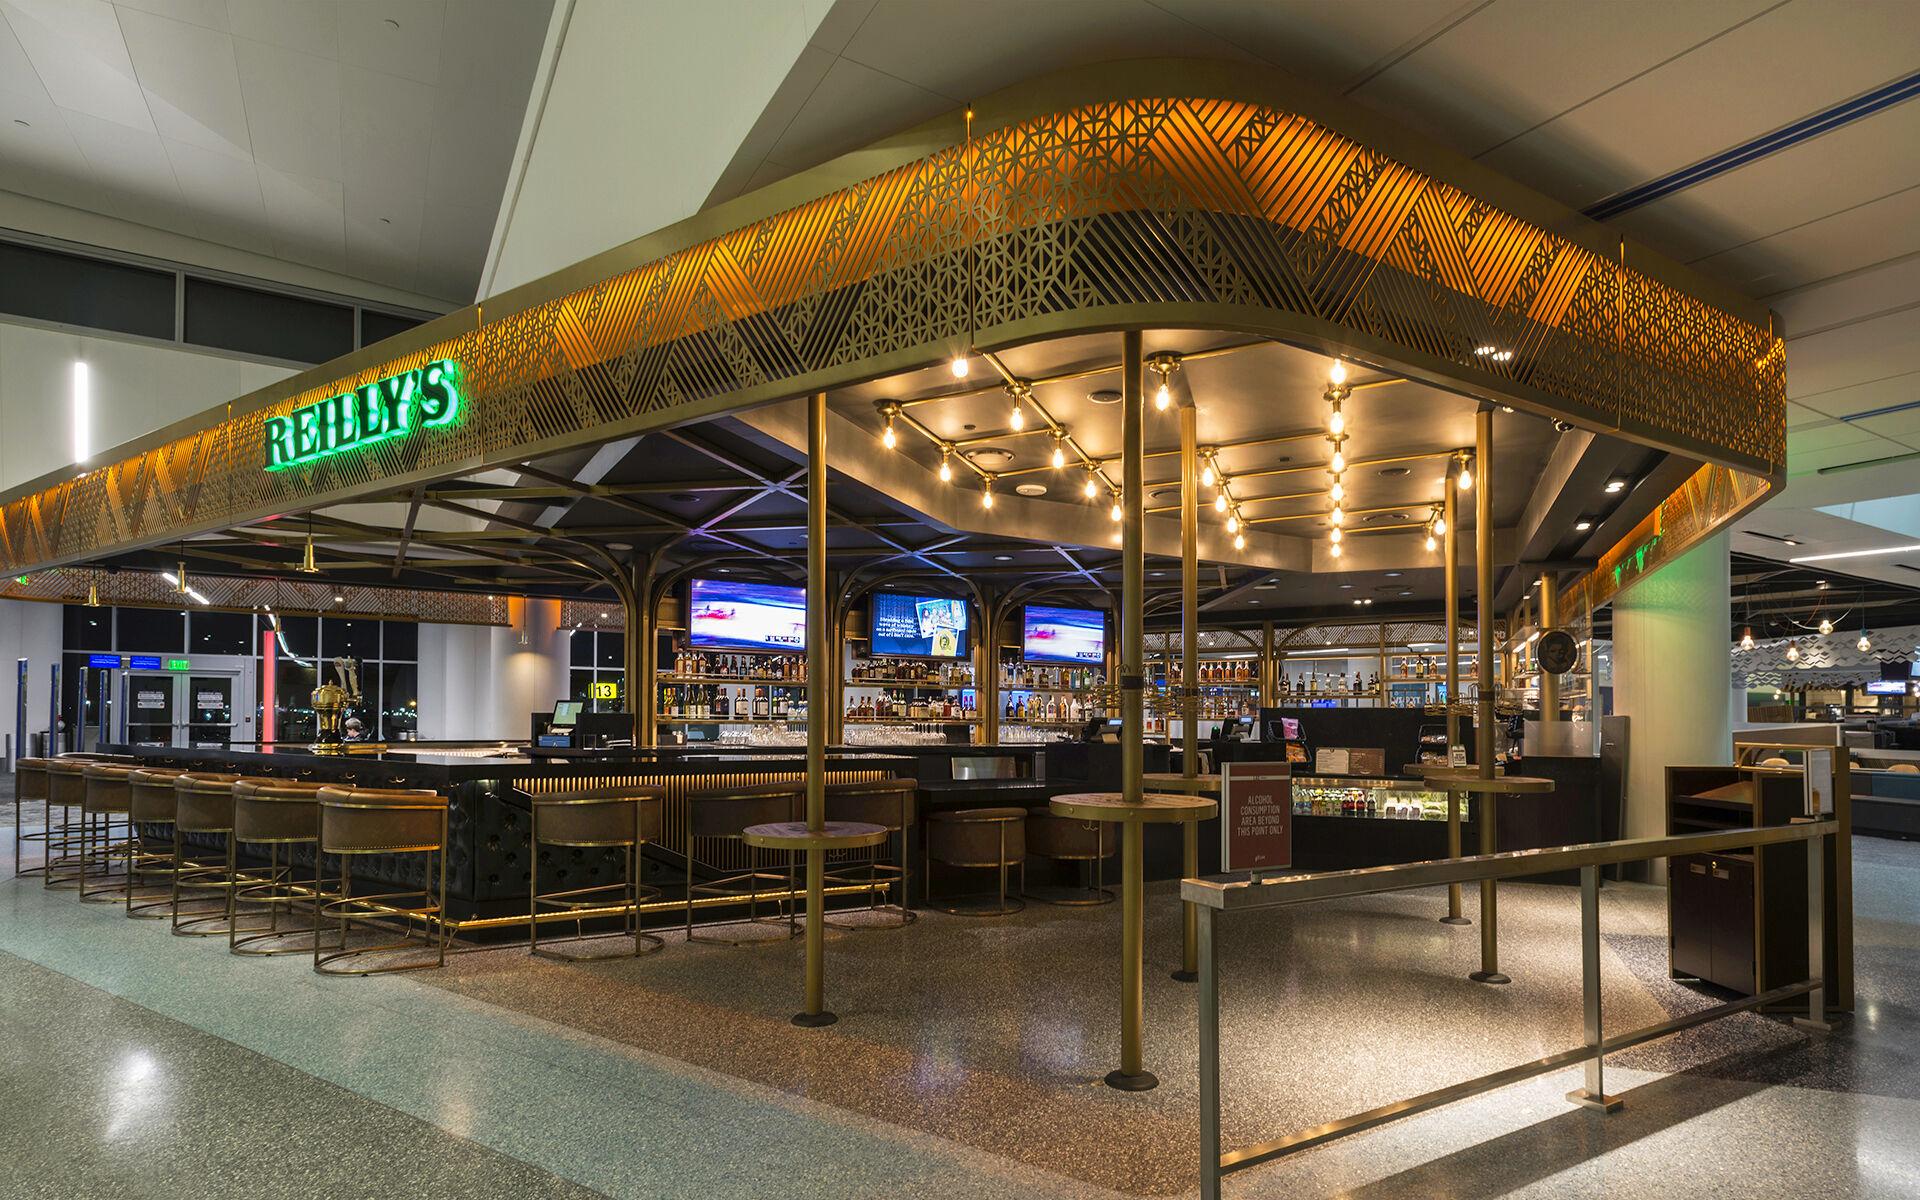 Terminal 1 Multiple Restaurants - Los Angeles International Airport